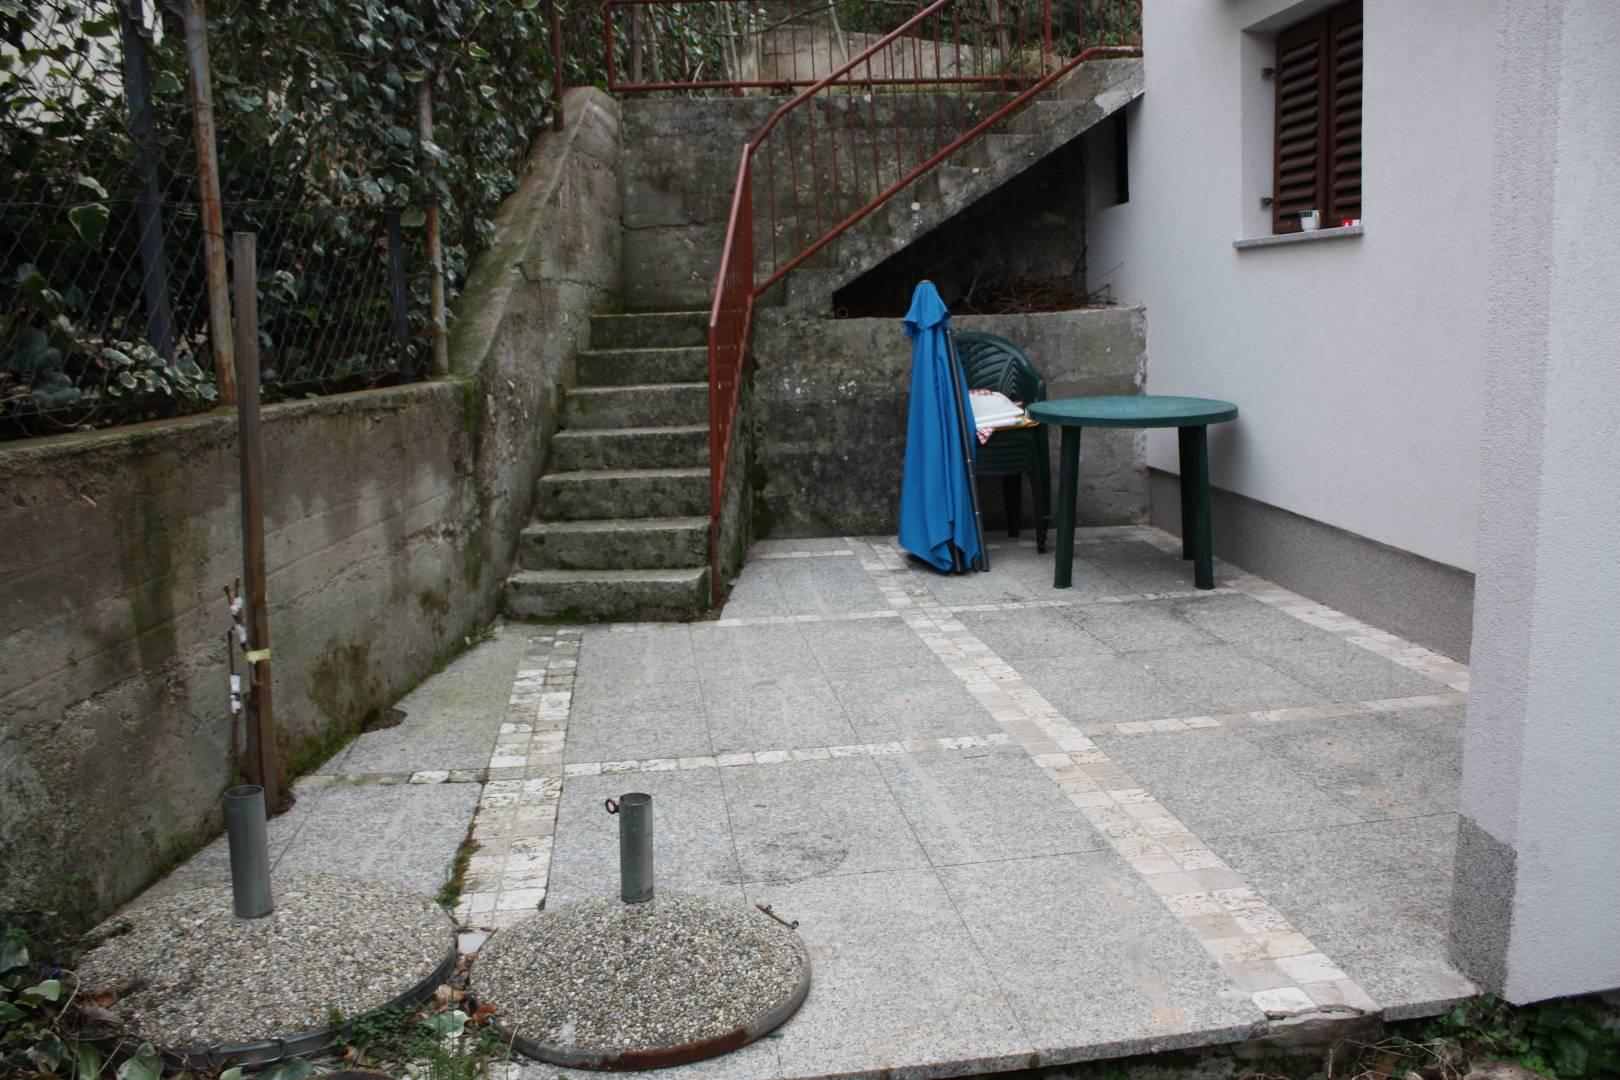 IMG 9450 - Wohnunh Kornati